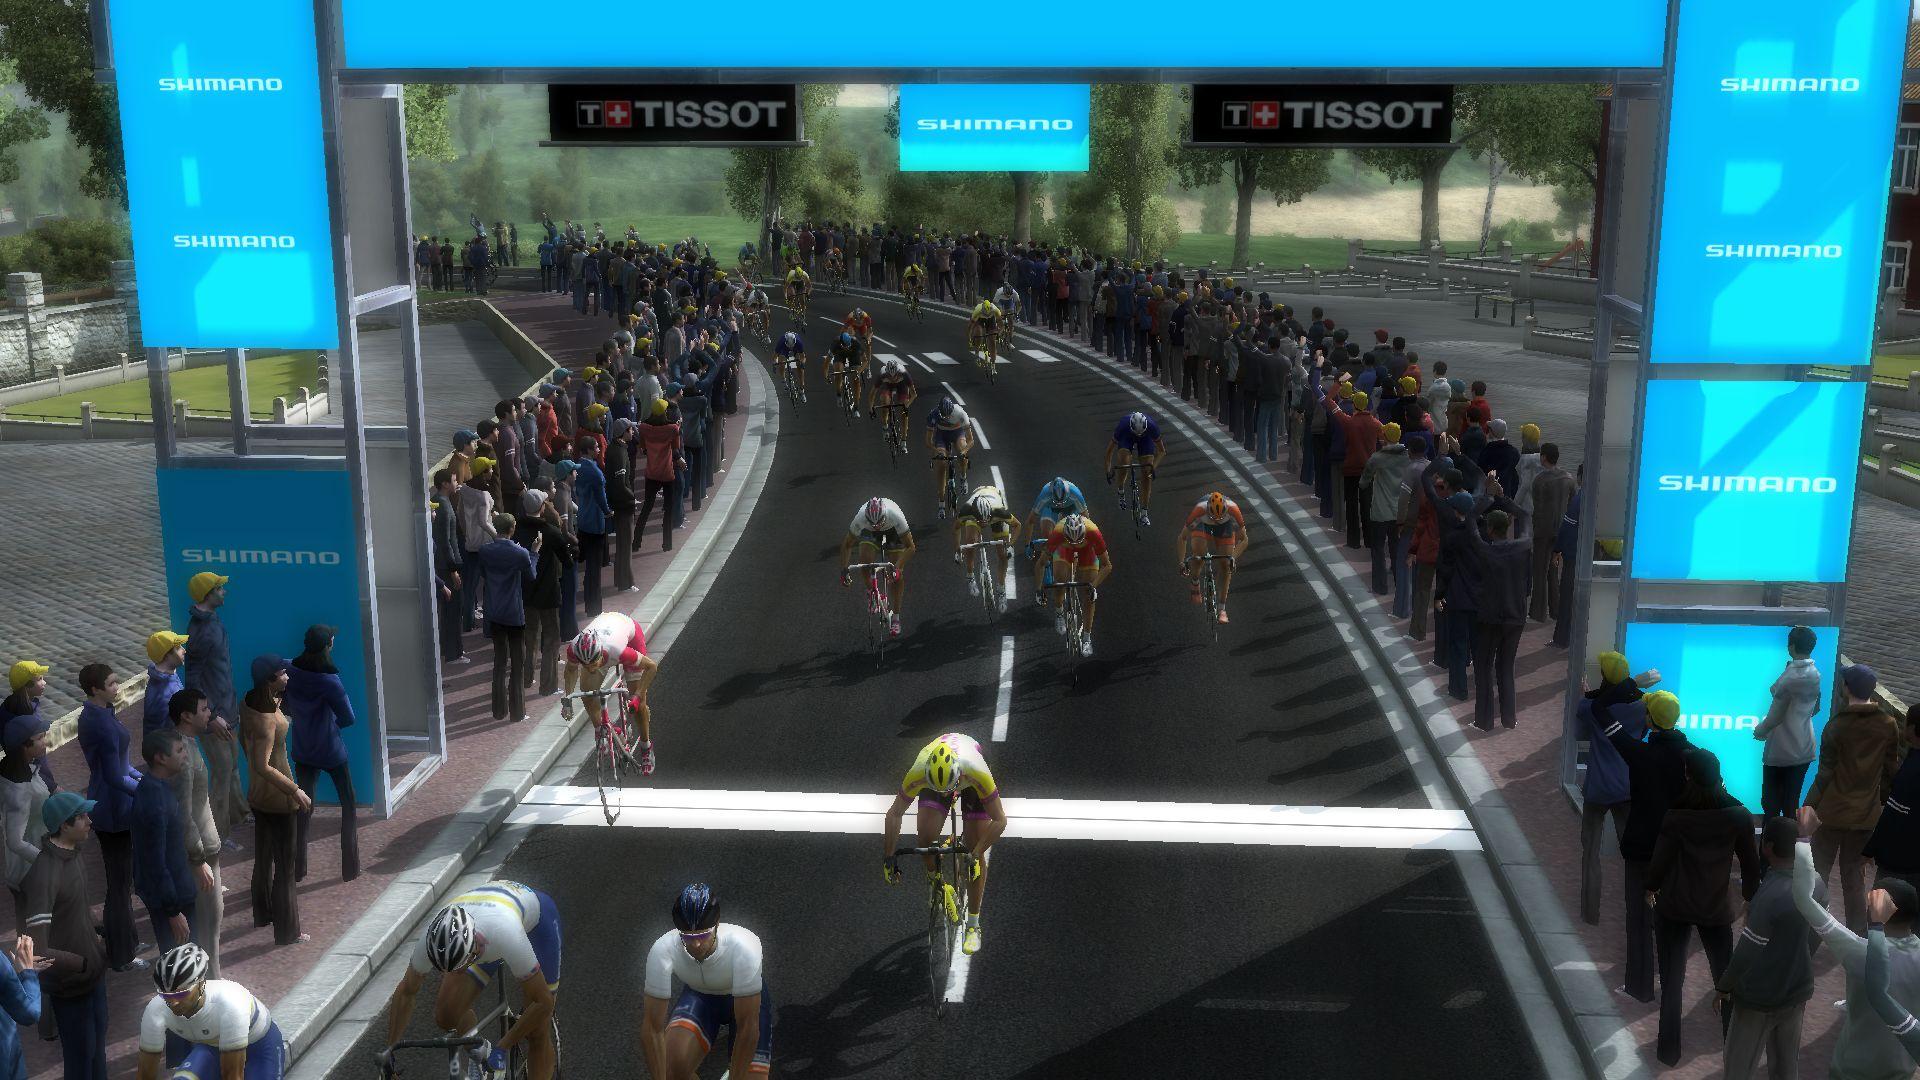 pcmdaily.com/images/mg/2017/Races/PT/TONE/TNES3%2028.jpg